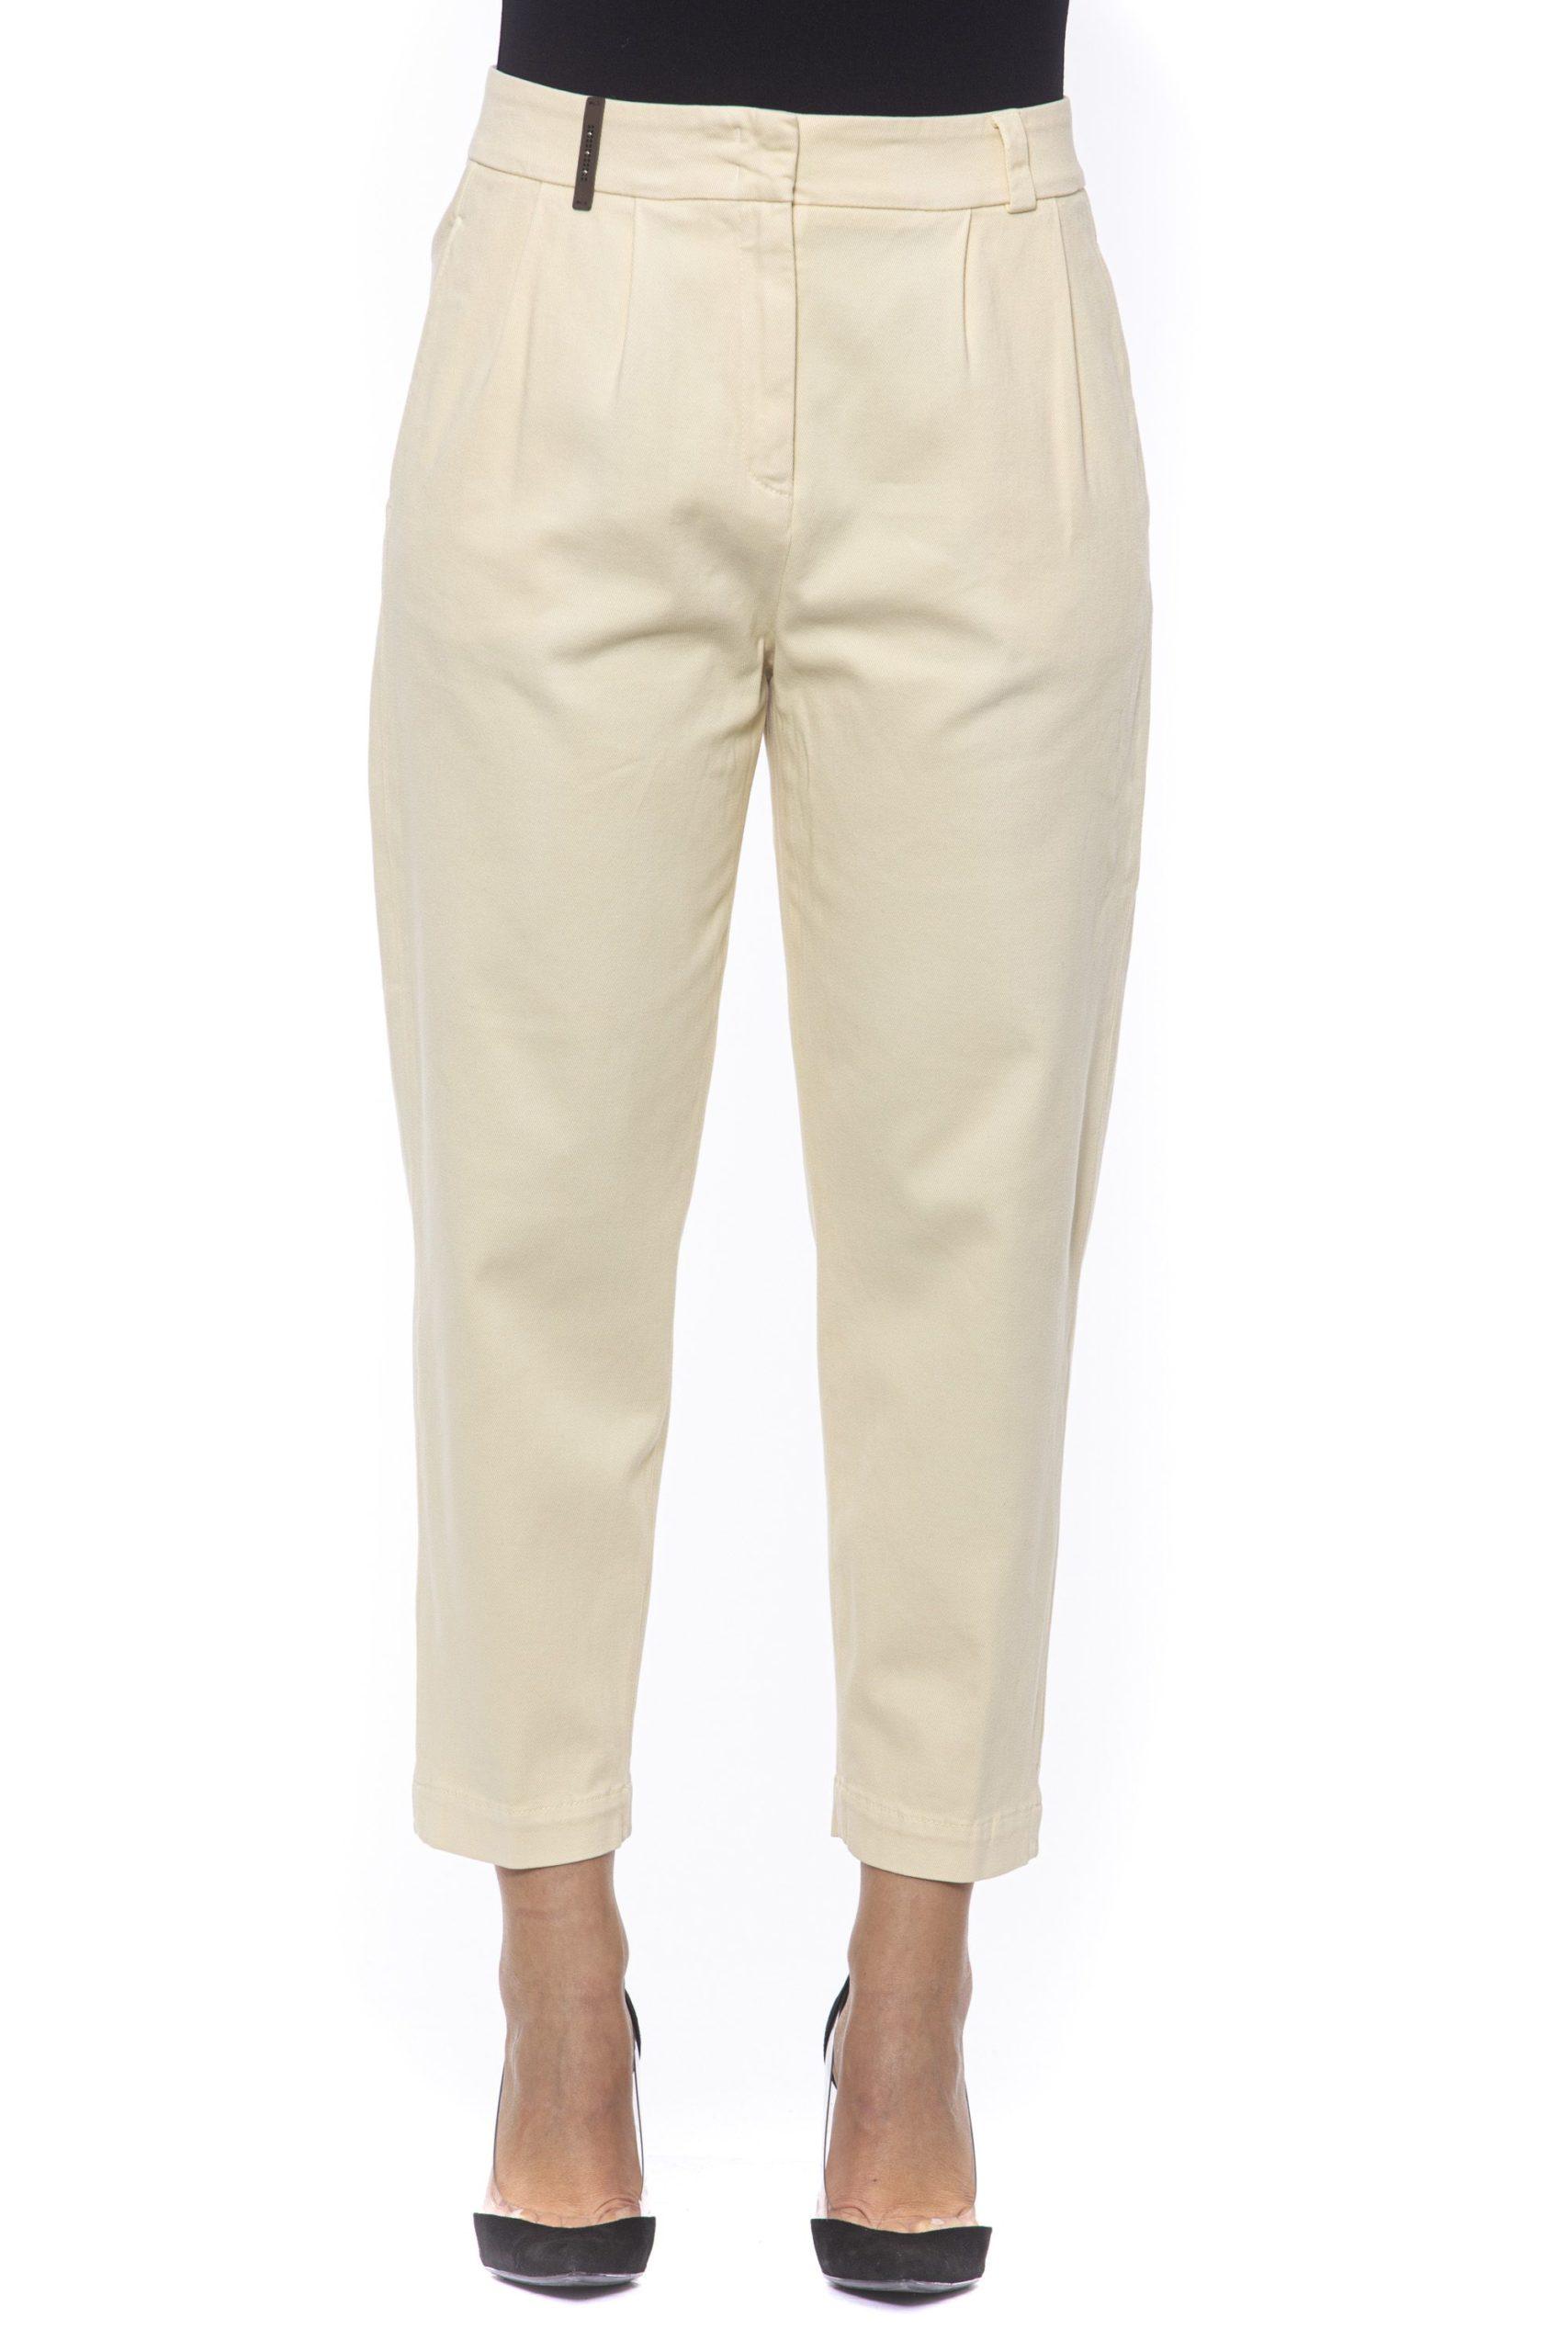 Giallo Jeans & Pant - IT42   S